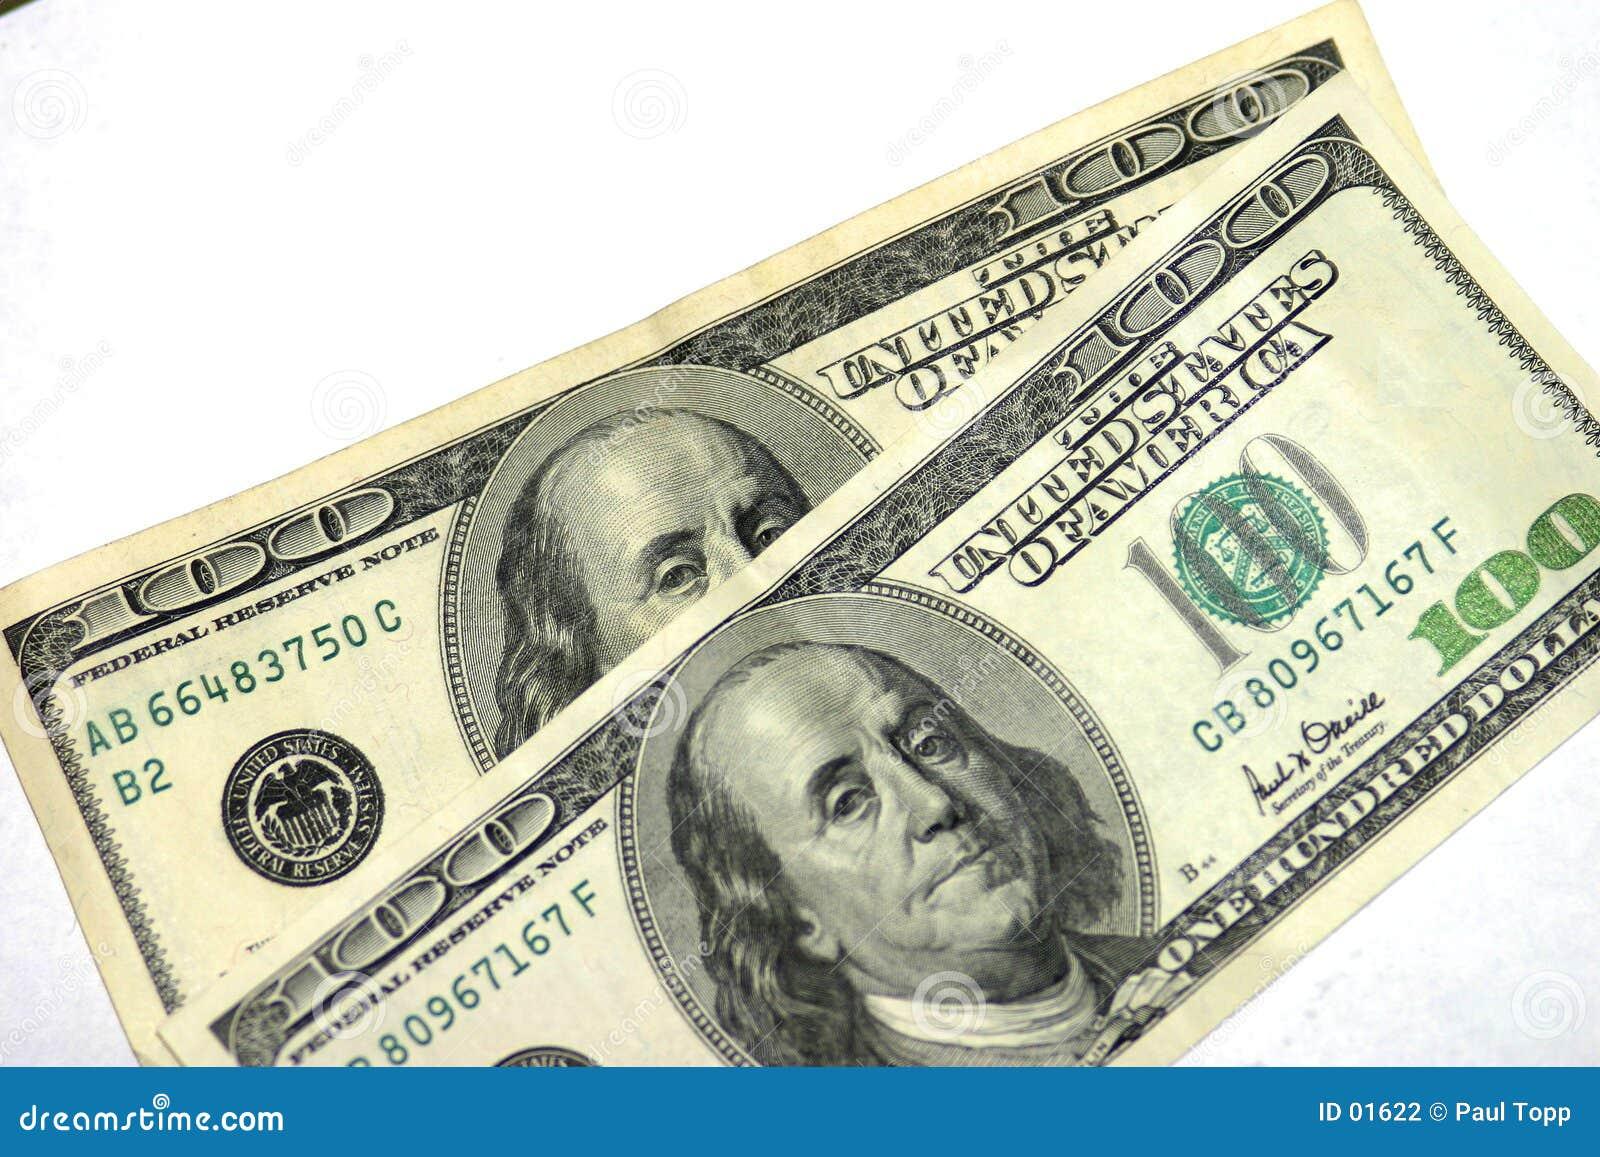 Two One Hundred Dollar Bills